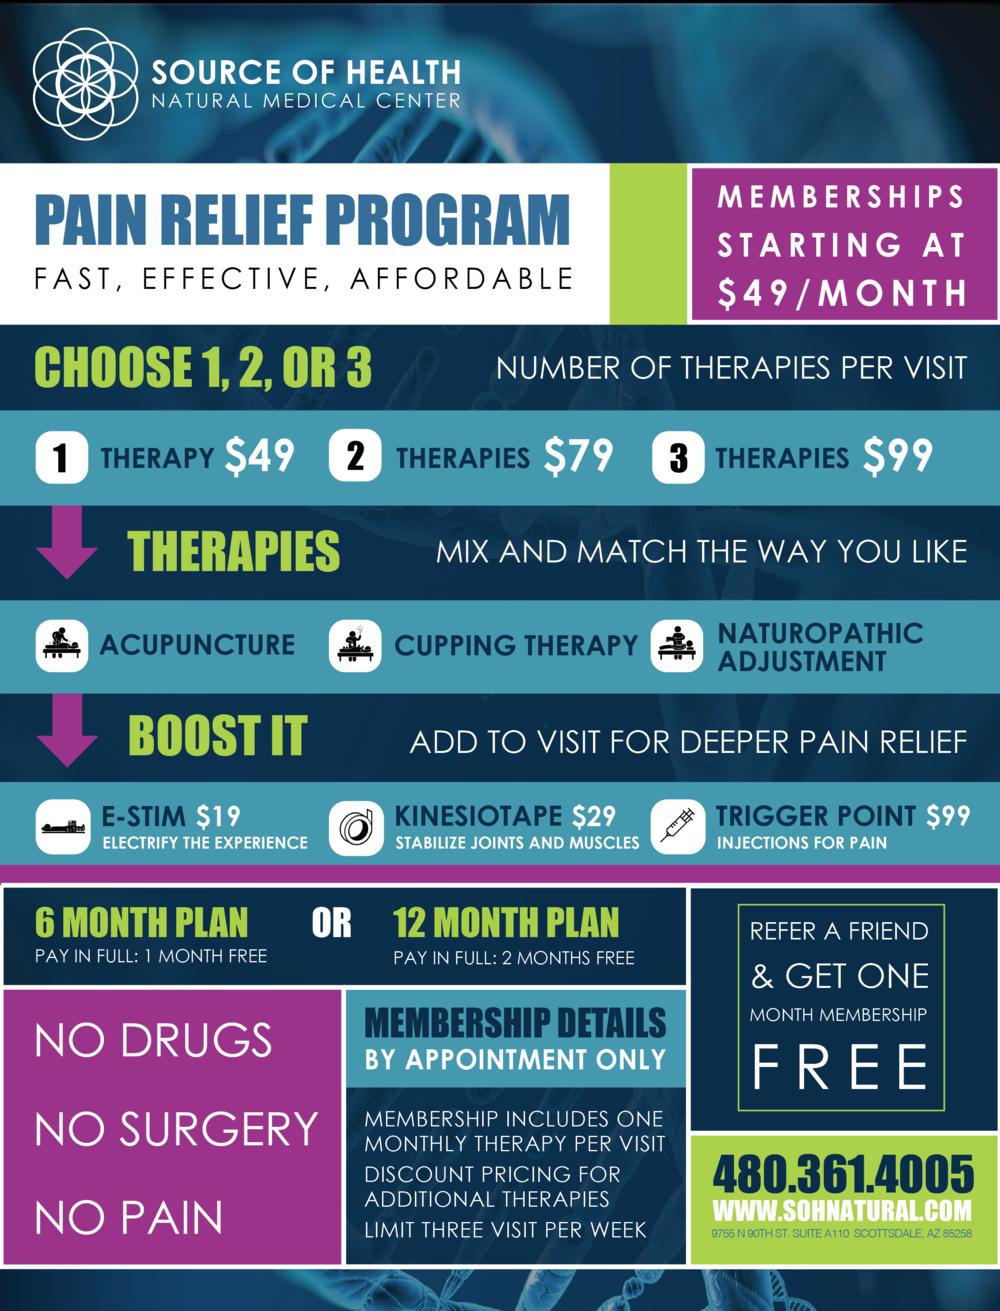 Source of Health Pain Relief Program